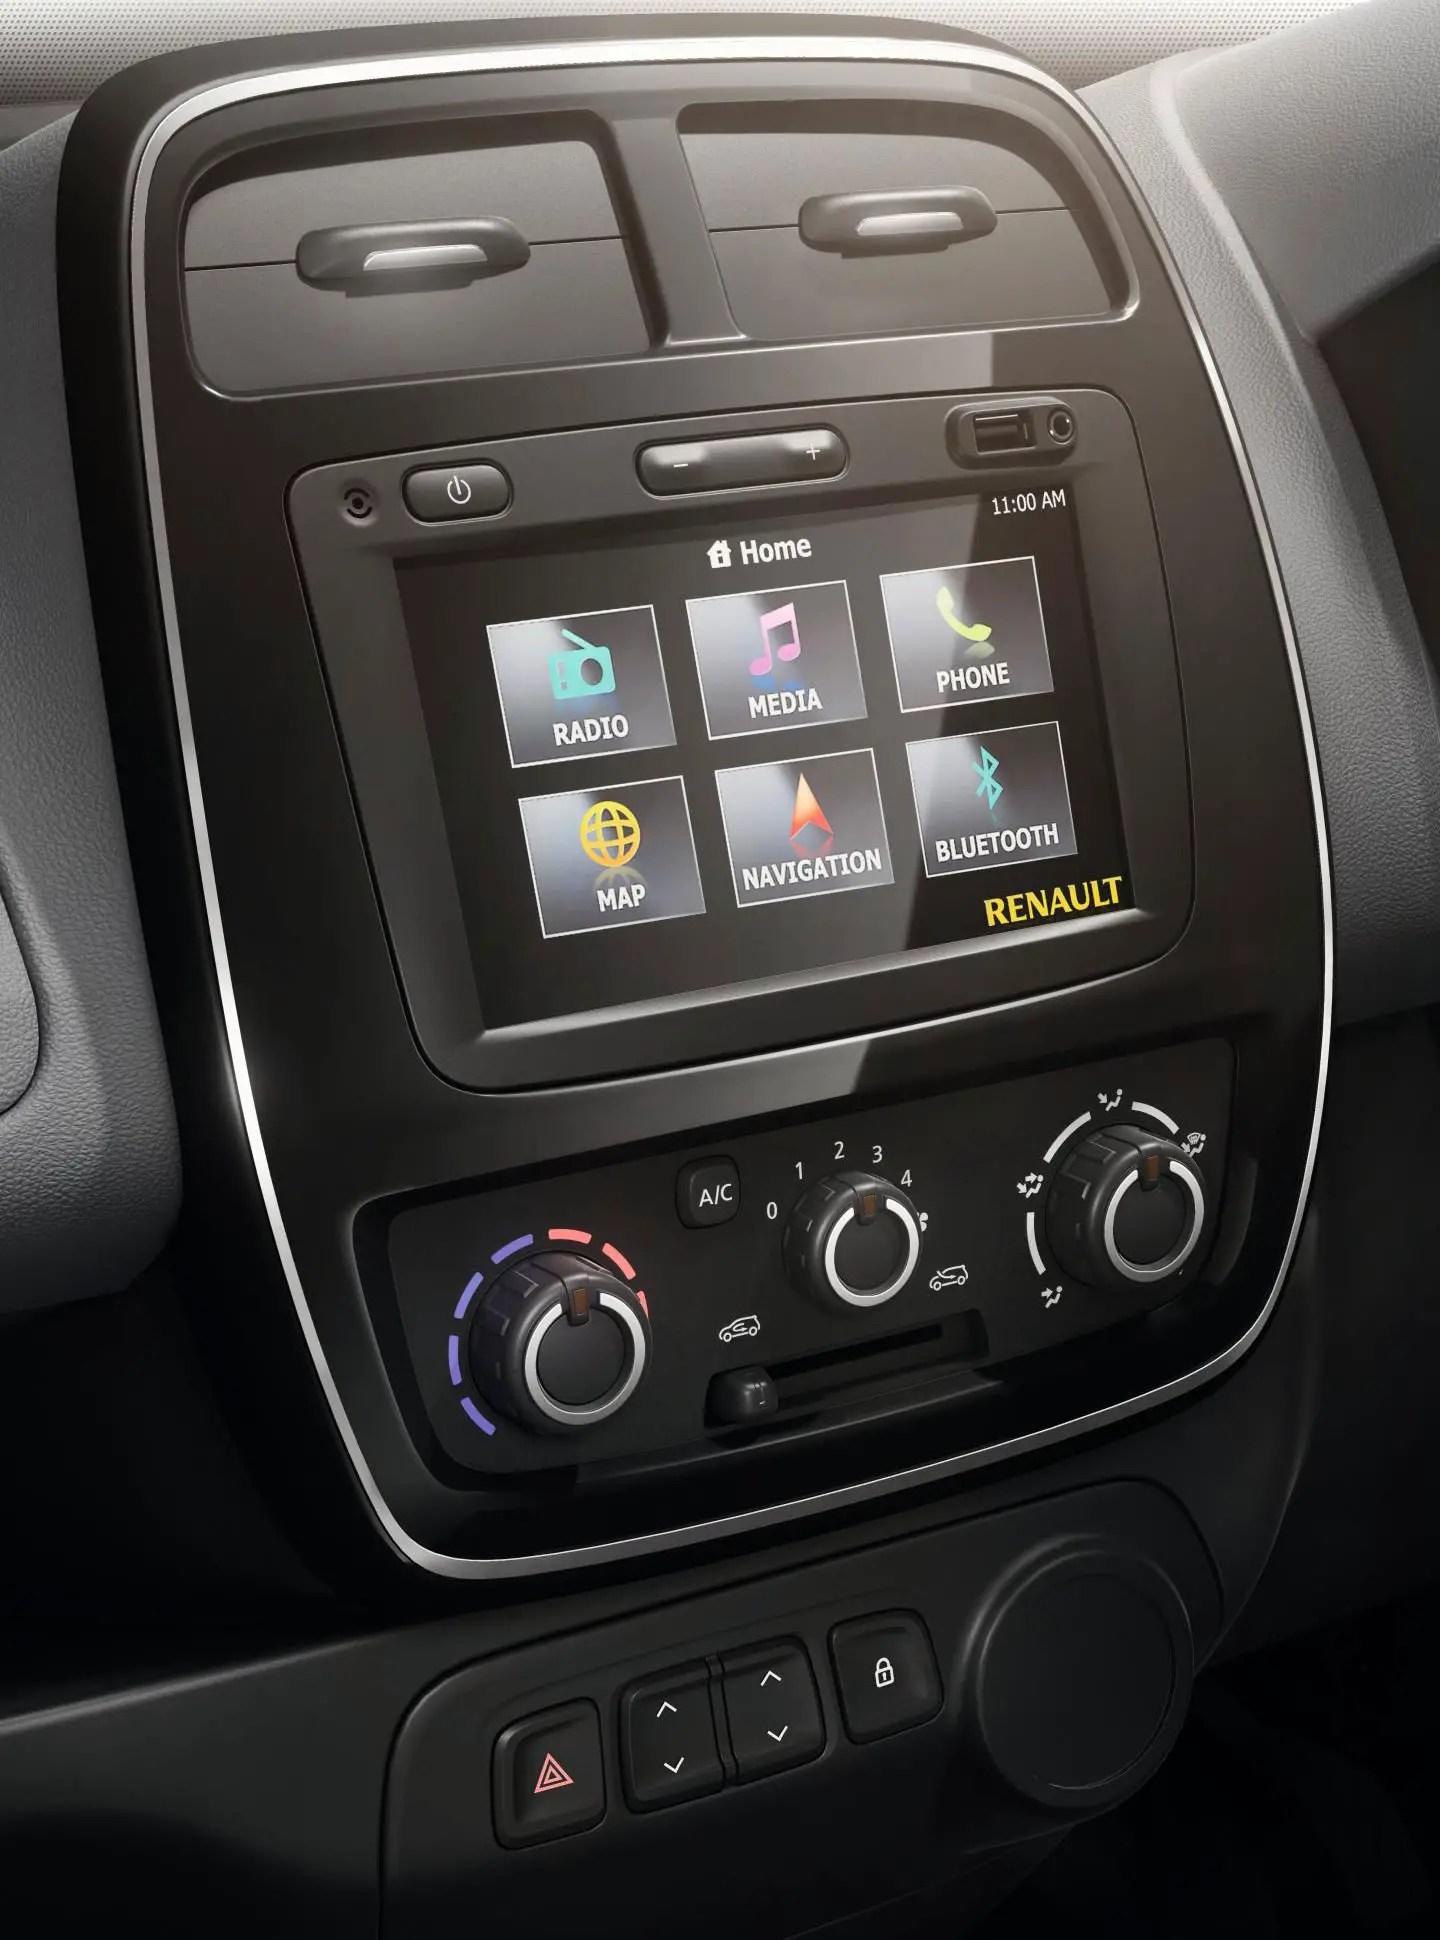 Renault Kwid Standard Interior Image Gallery Pictures Photos